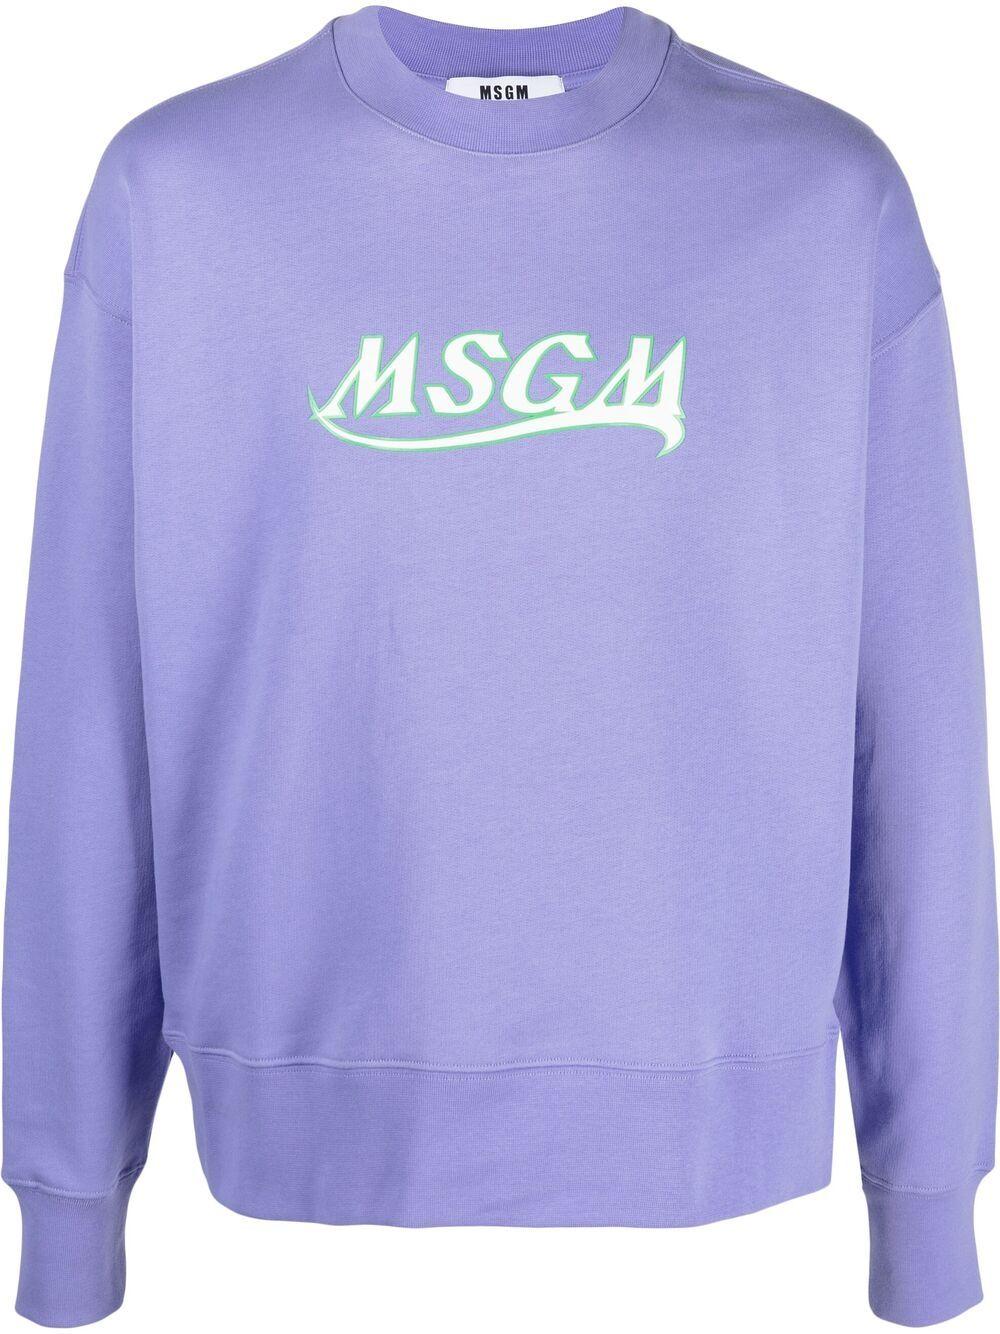 logo sweatshirt man light blue in cotton MSGM | Sweatshirts | 3040MM185 21709972